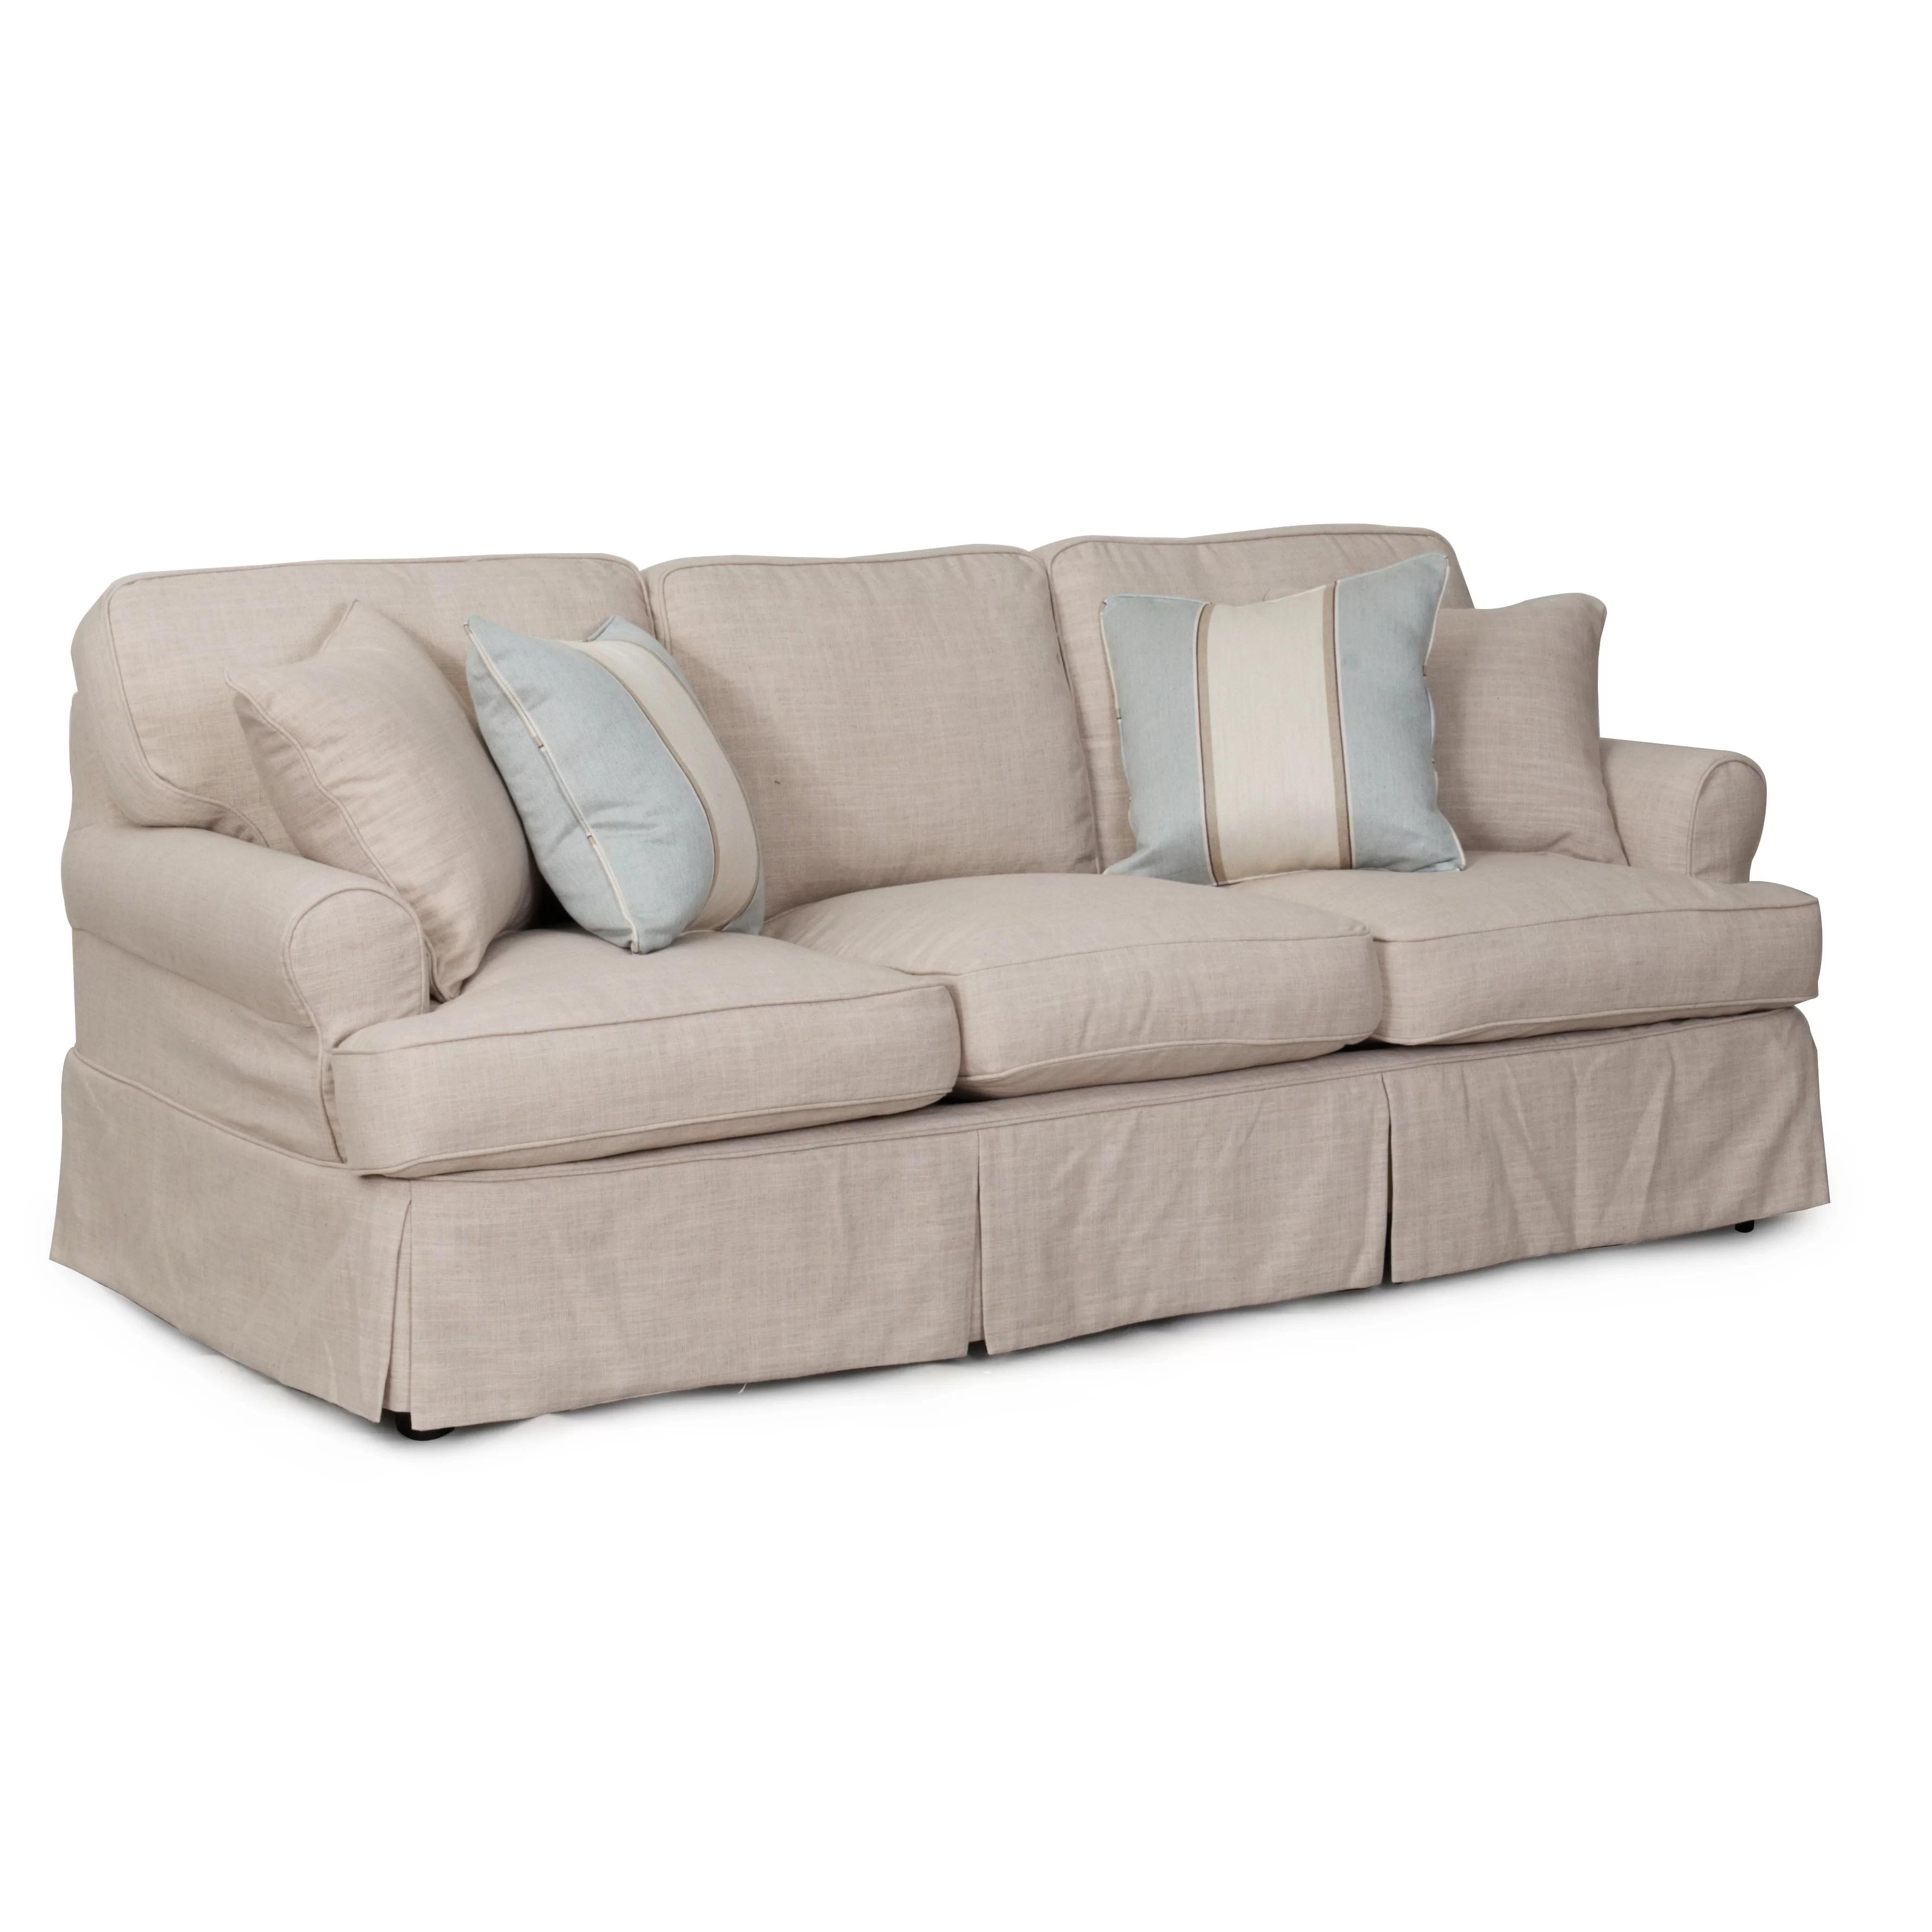 sure fit logan sofa slipcover ellis collection slipcovers t cushion